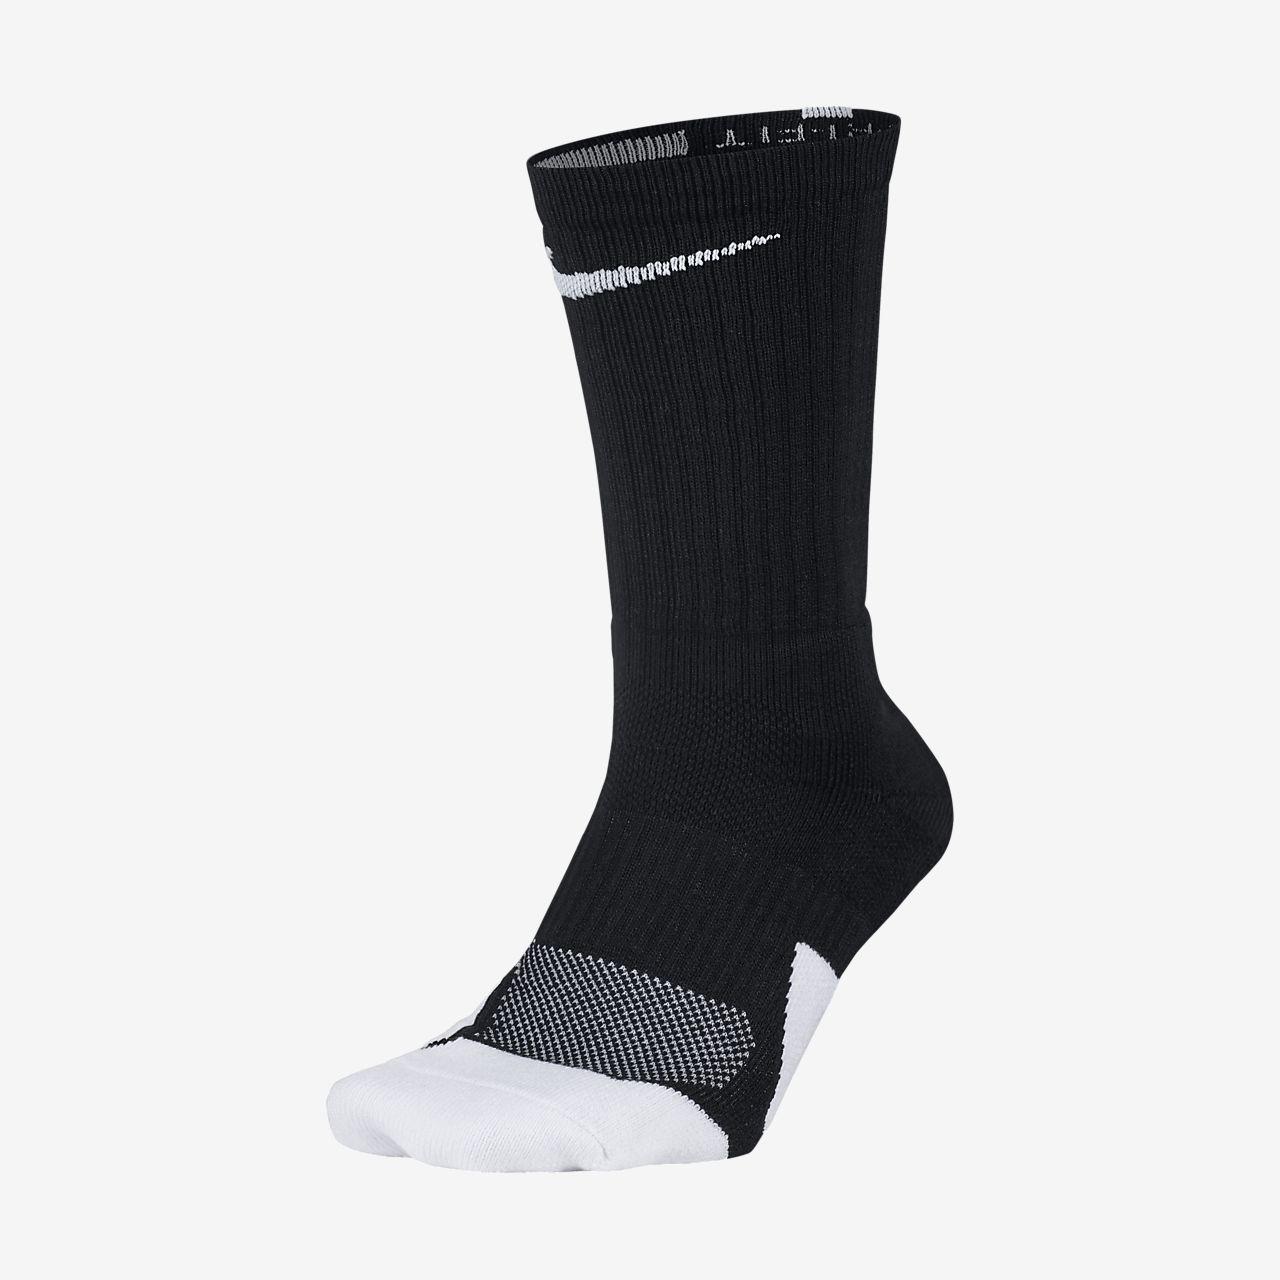 Dry Basketball Crew Chaussettes De Nike 5 Elite 1 0wk8OPn